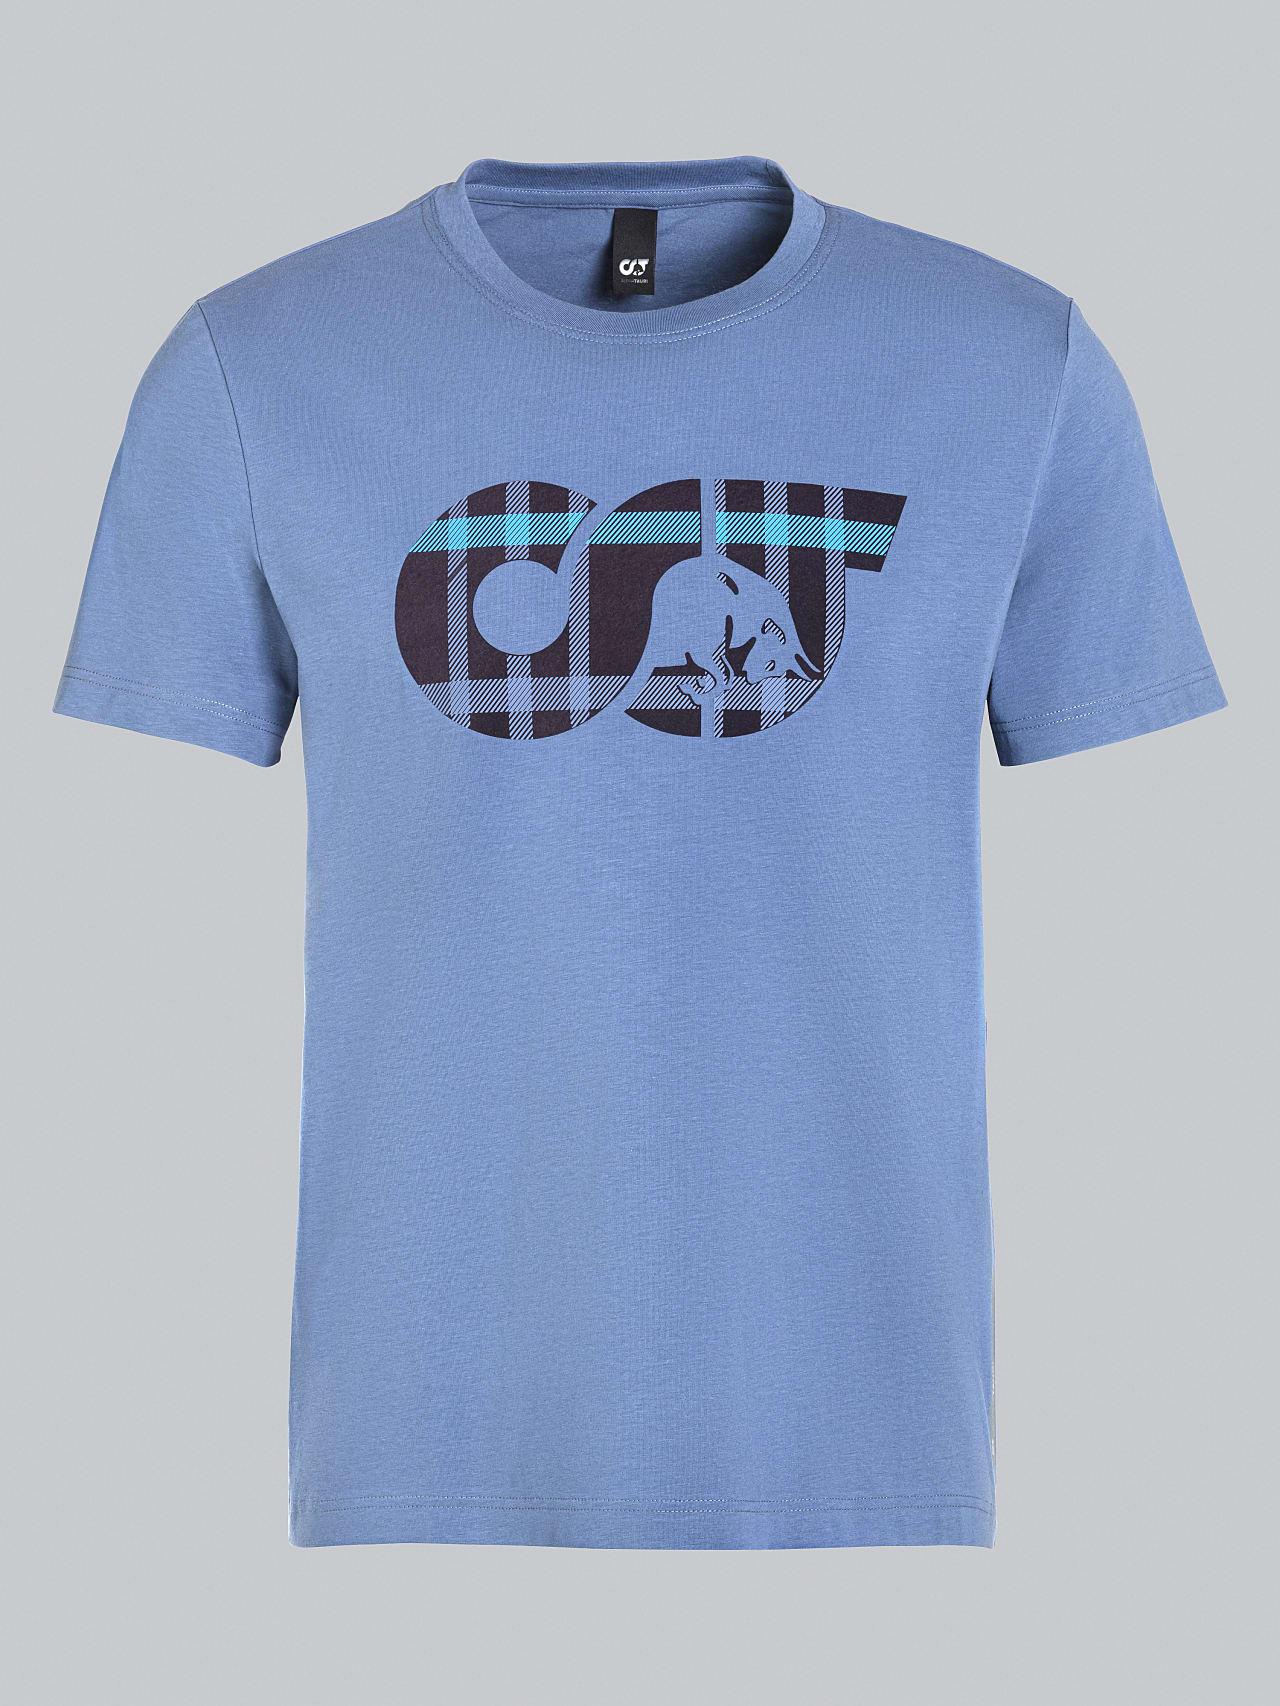 JABIS V1.Y5.02 Logo Print T-Shirt light blue Back Alpha Tauri